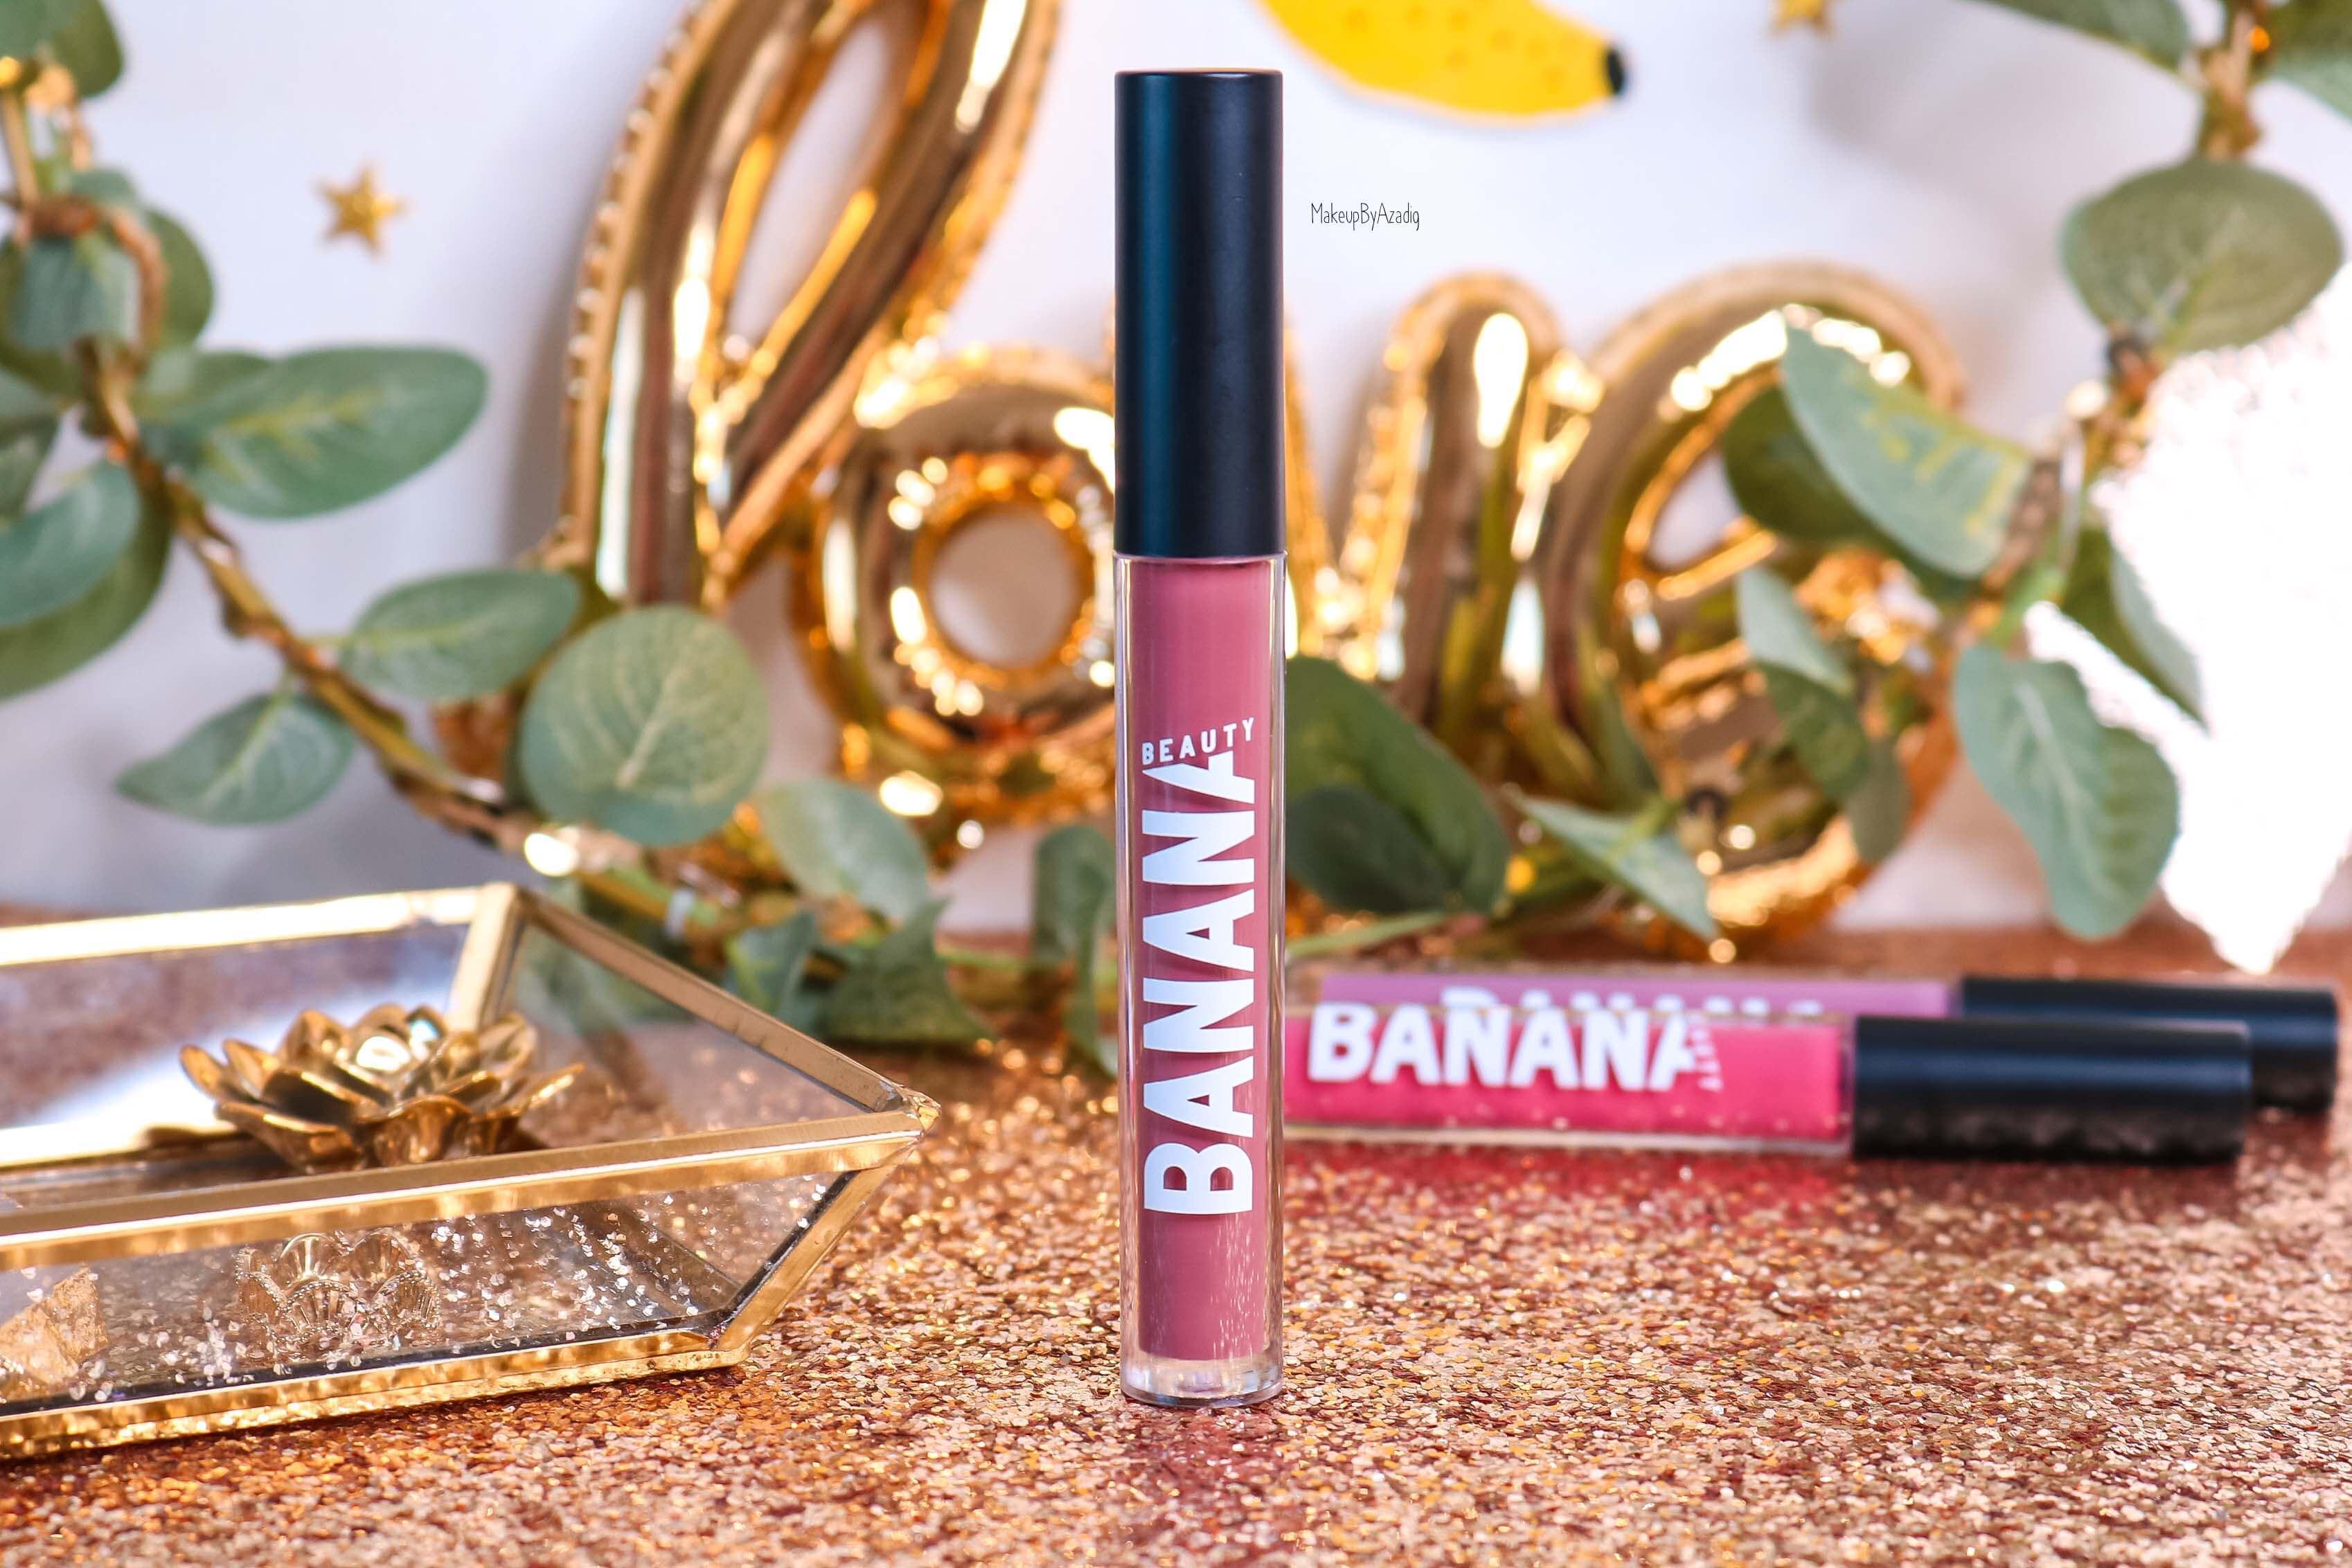 revue-rouge-a-levres-lipstick-banana-beauty-avis-prix-swatch-partenariat-ohlalicious-lady-licious-heels-up-makeupbyazadig-nude-collector-code-promo-vintage